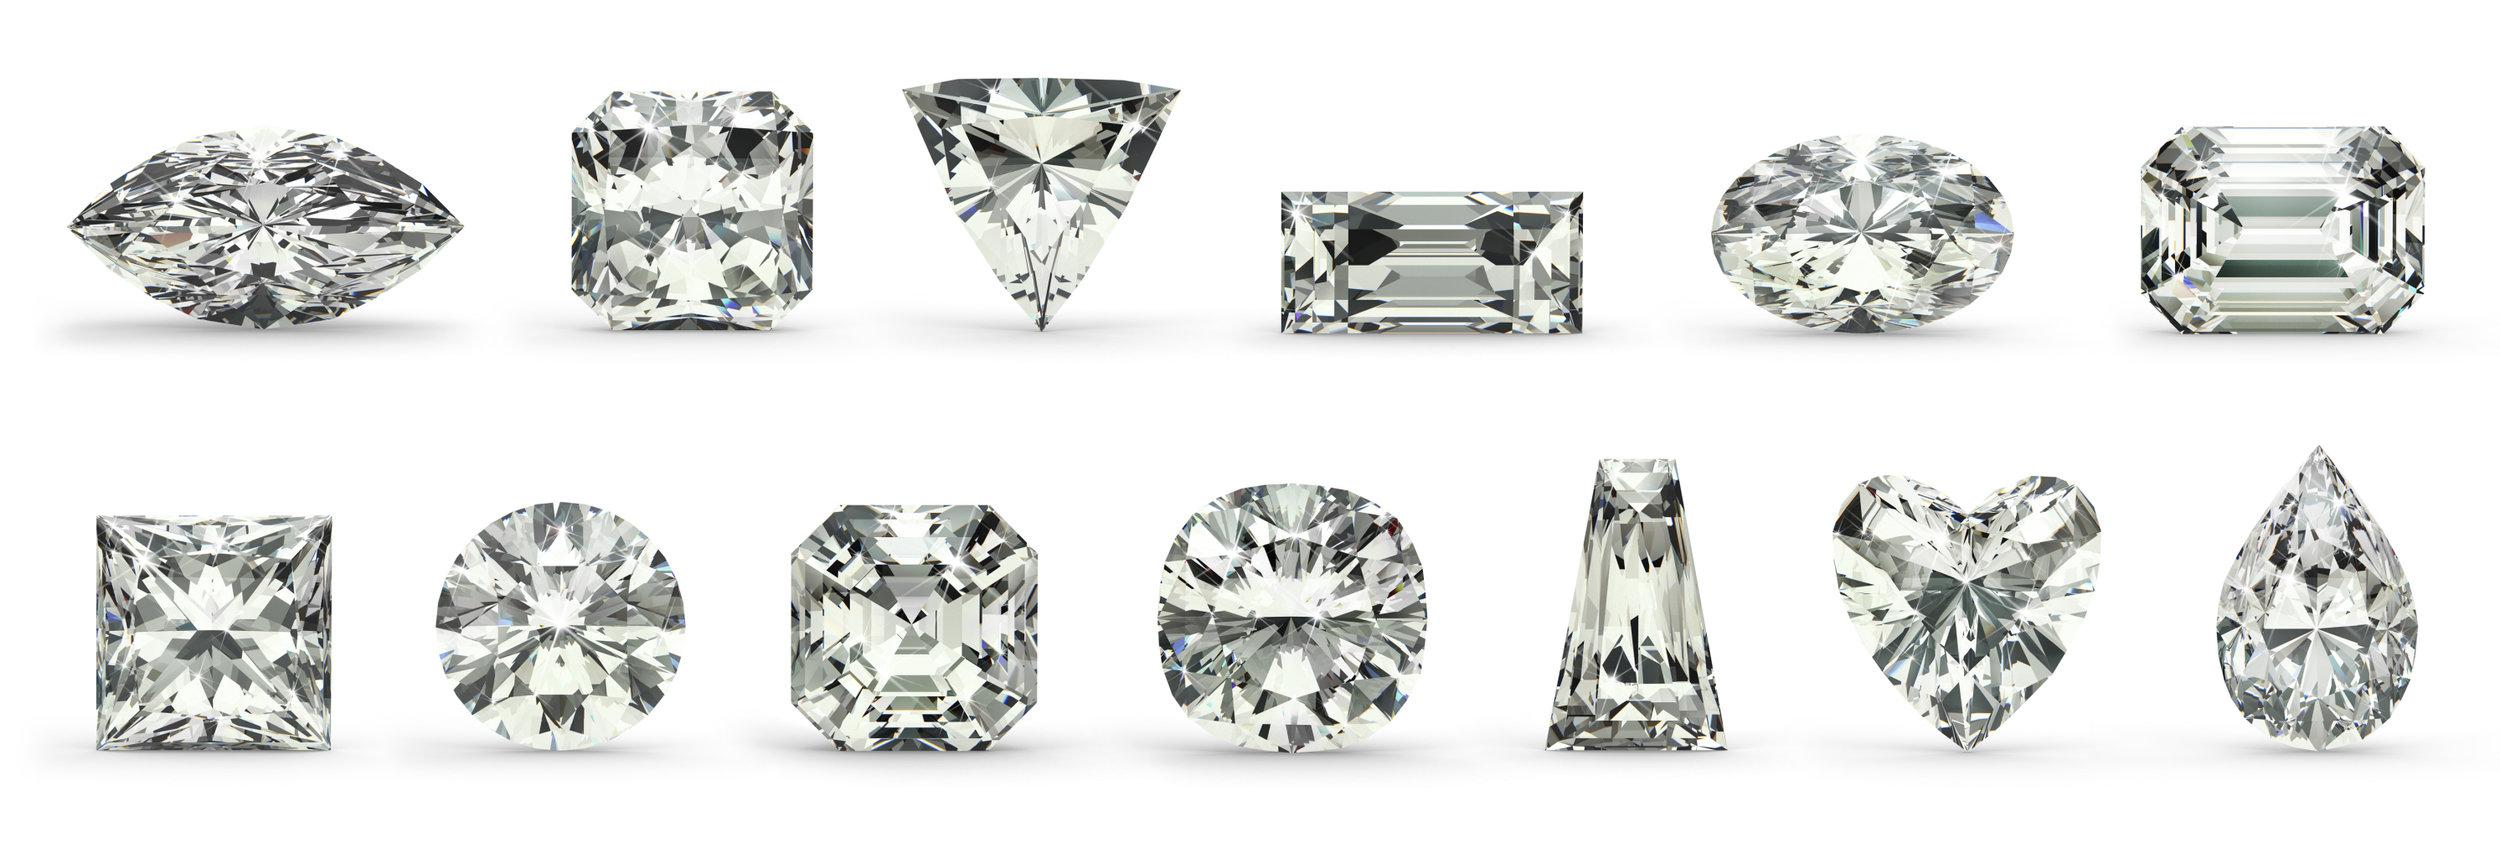 diamond-shapes.jpg